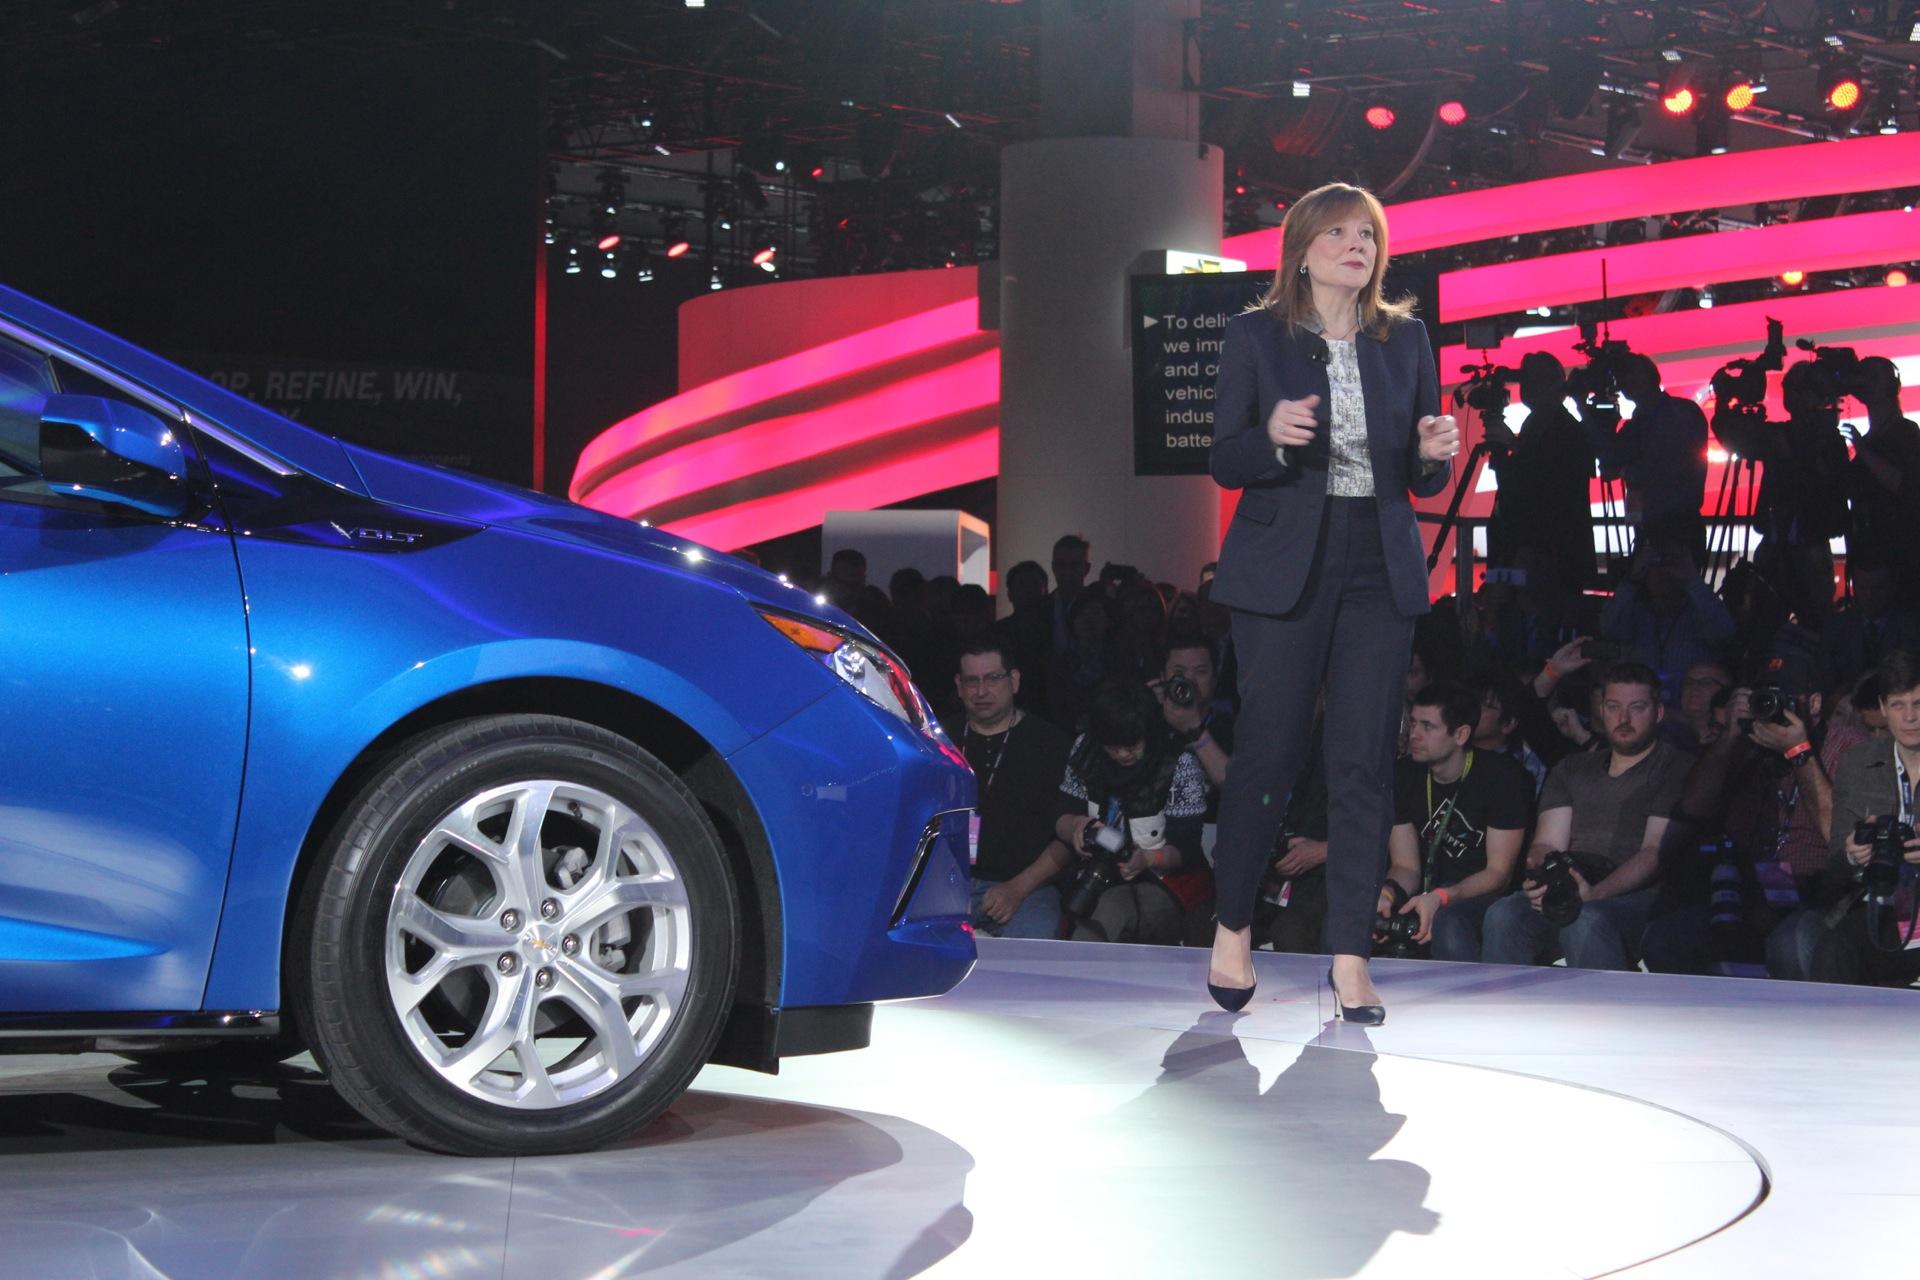 Chevy Bolt, 2016 Volt, New Sonata Hybrids, Honda Electric Car: The Week In Reverse (Video)